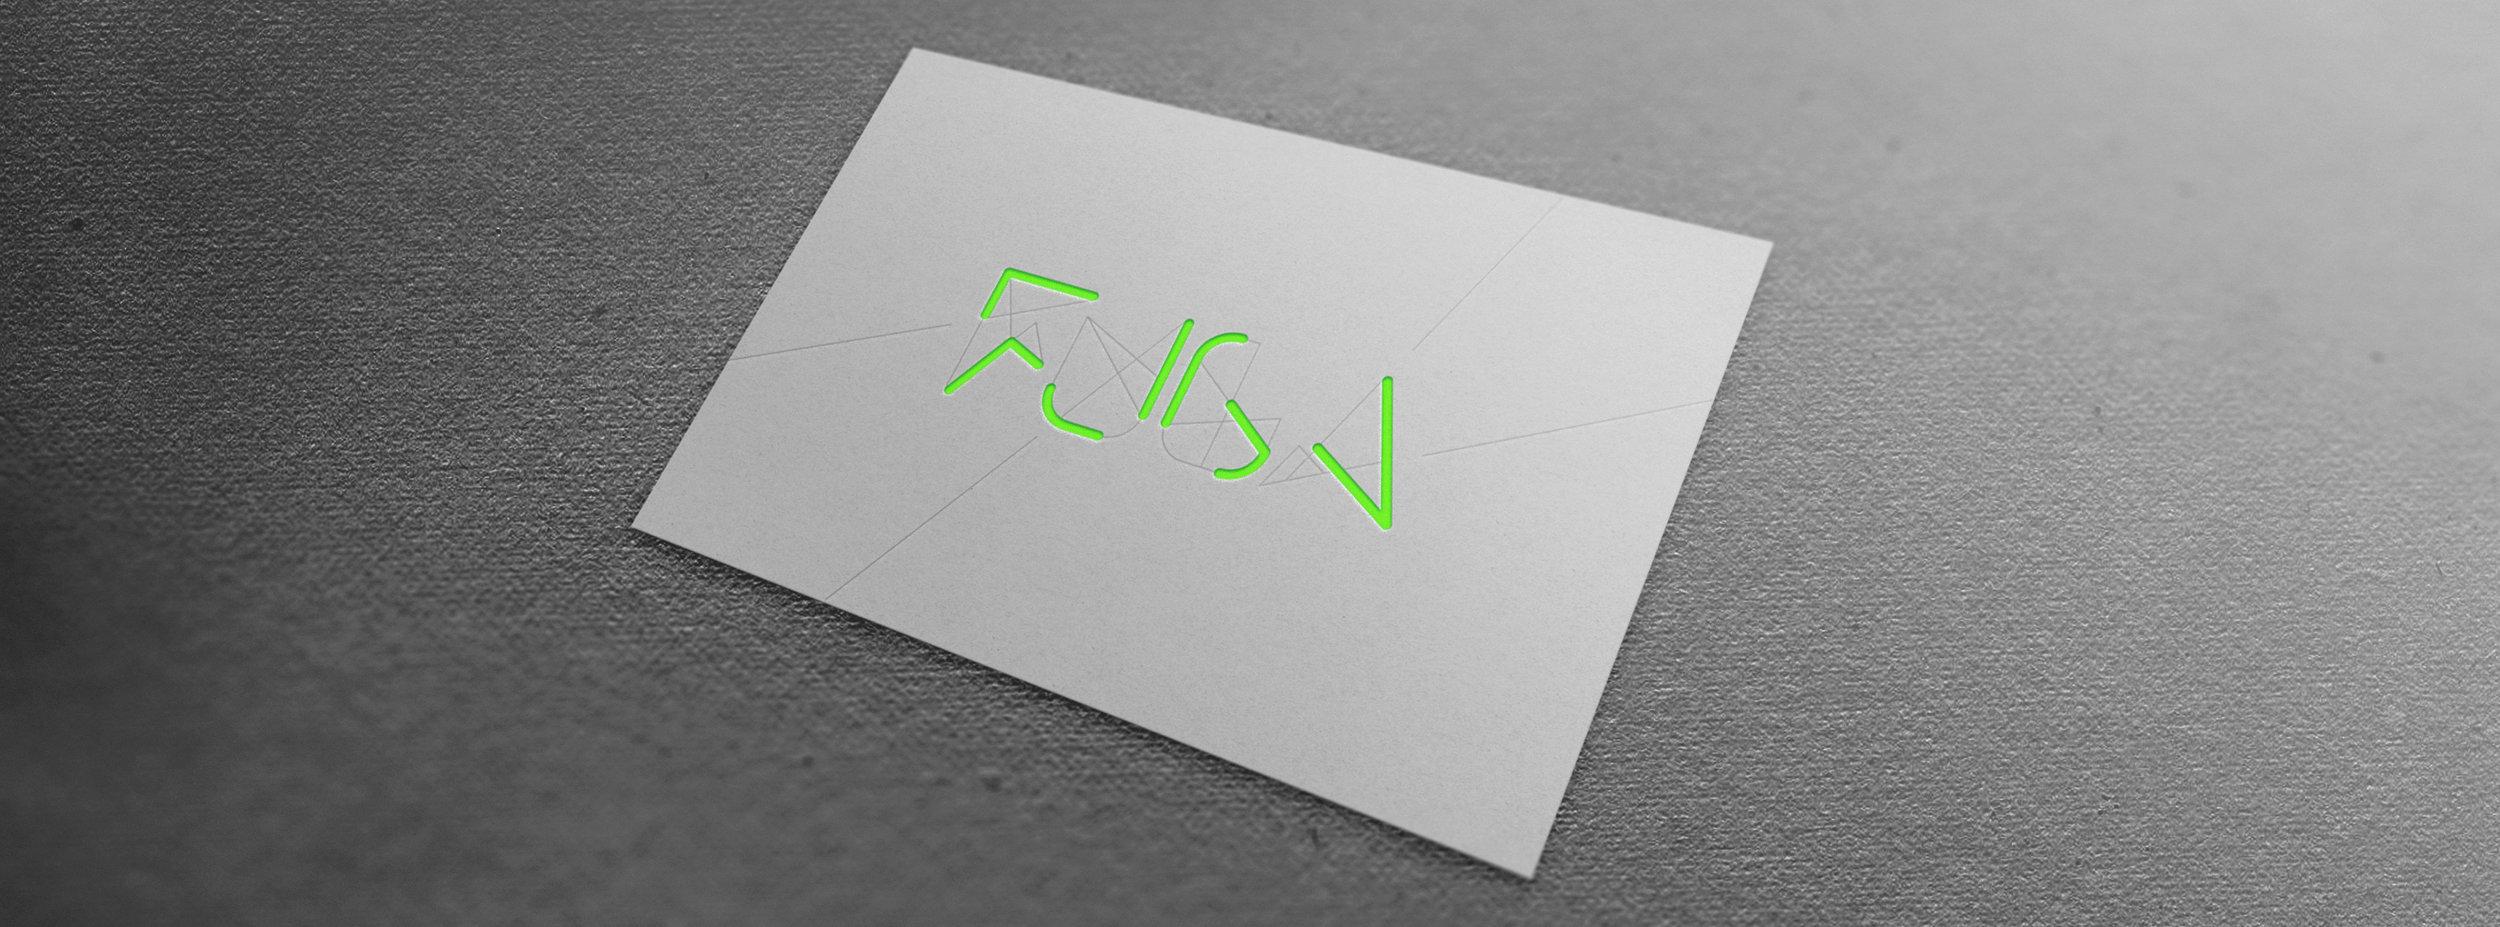 Fuga-mockup-Card-Pantone-Green_2 N.jpg